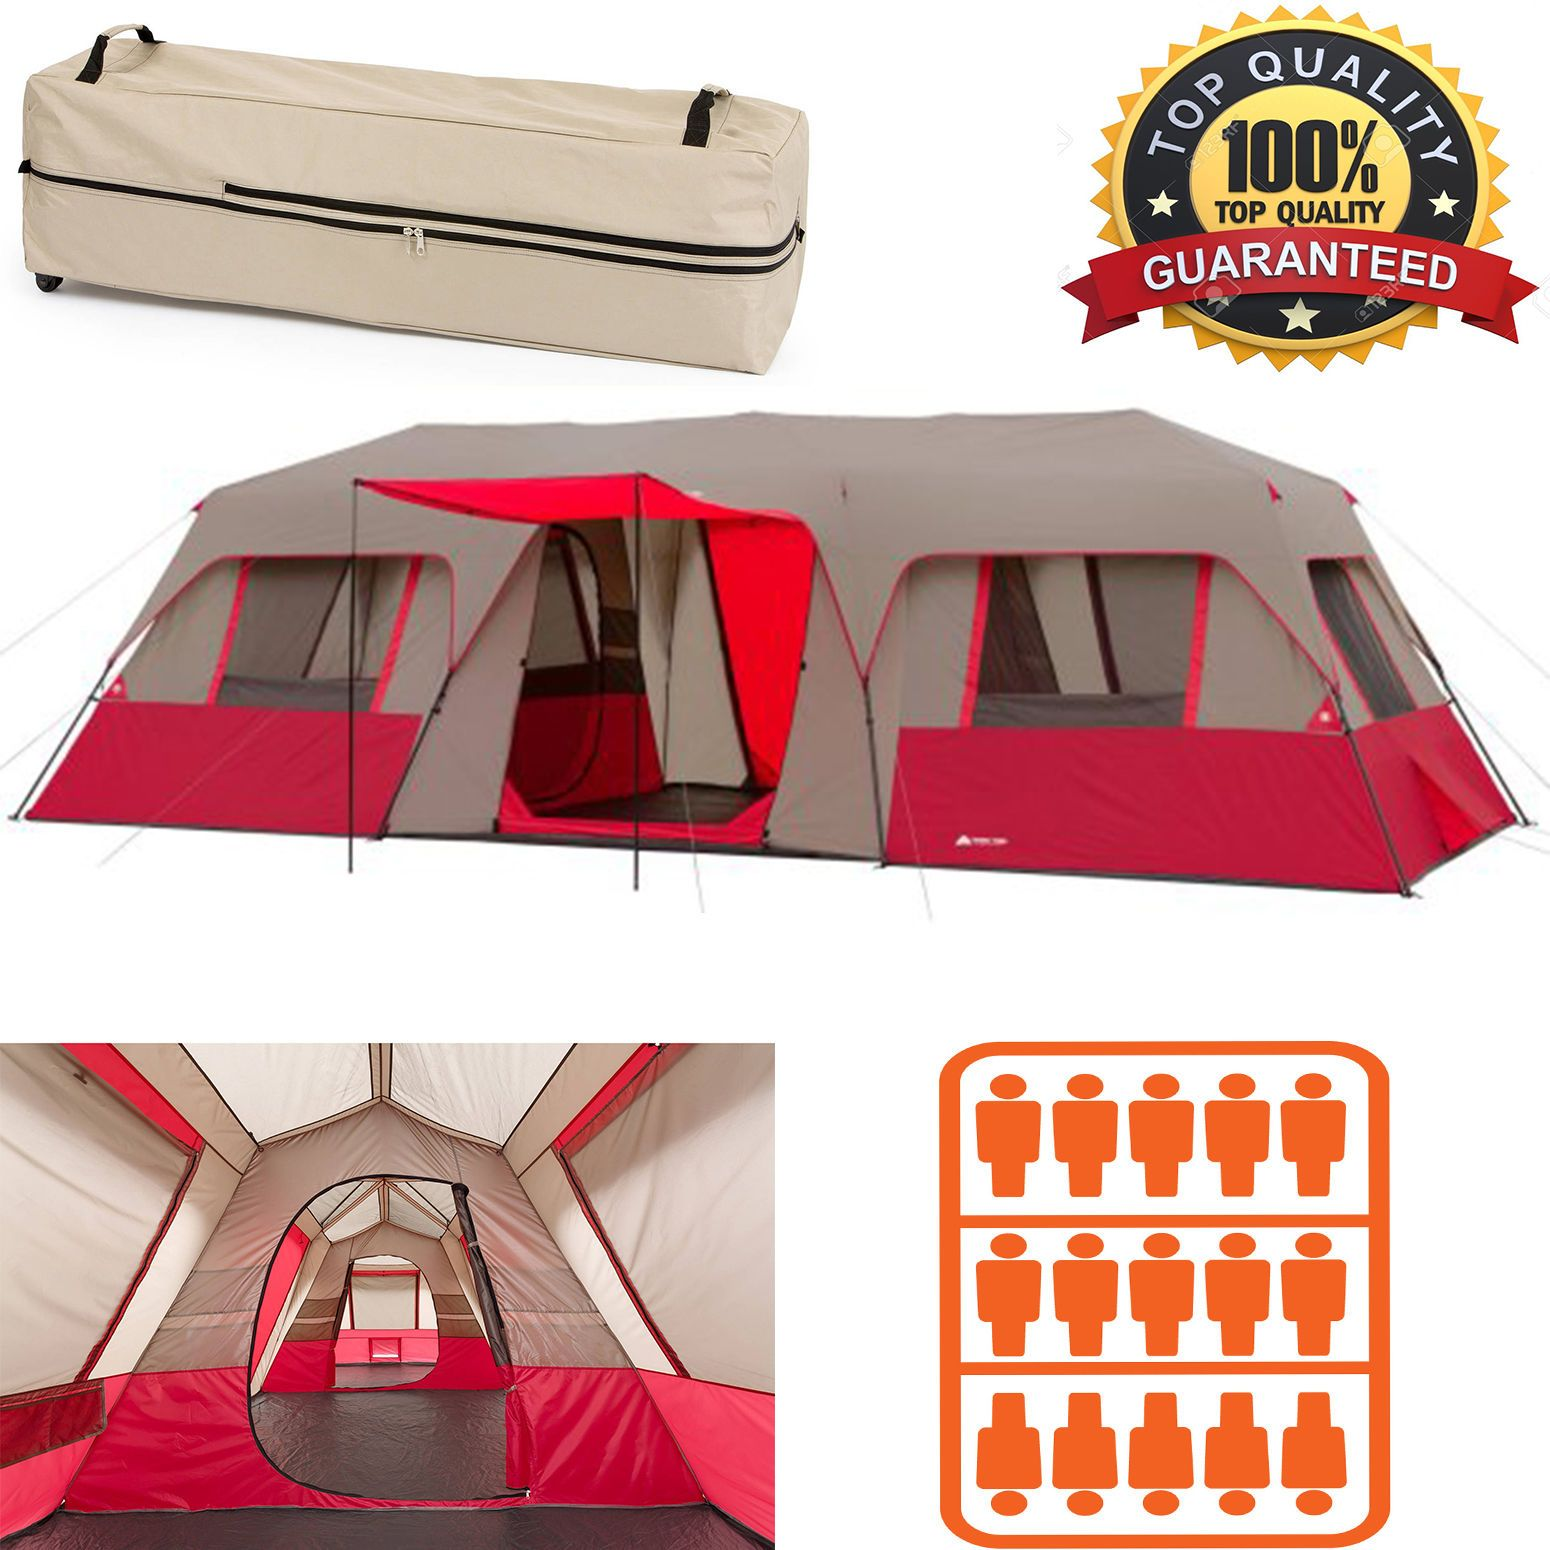 Ozark Trail 15 Person Instant Cabin Large Tent C&ing Split Plan Family 3-Room  sc 1 st  Pinterest & Ozark Trail 11 Person 3 Room Instant Cabin Family Large Tent ...